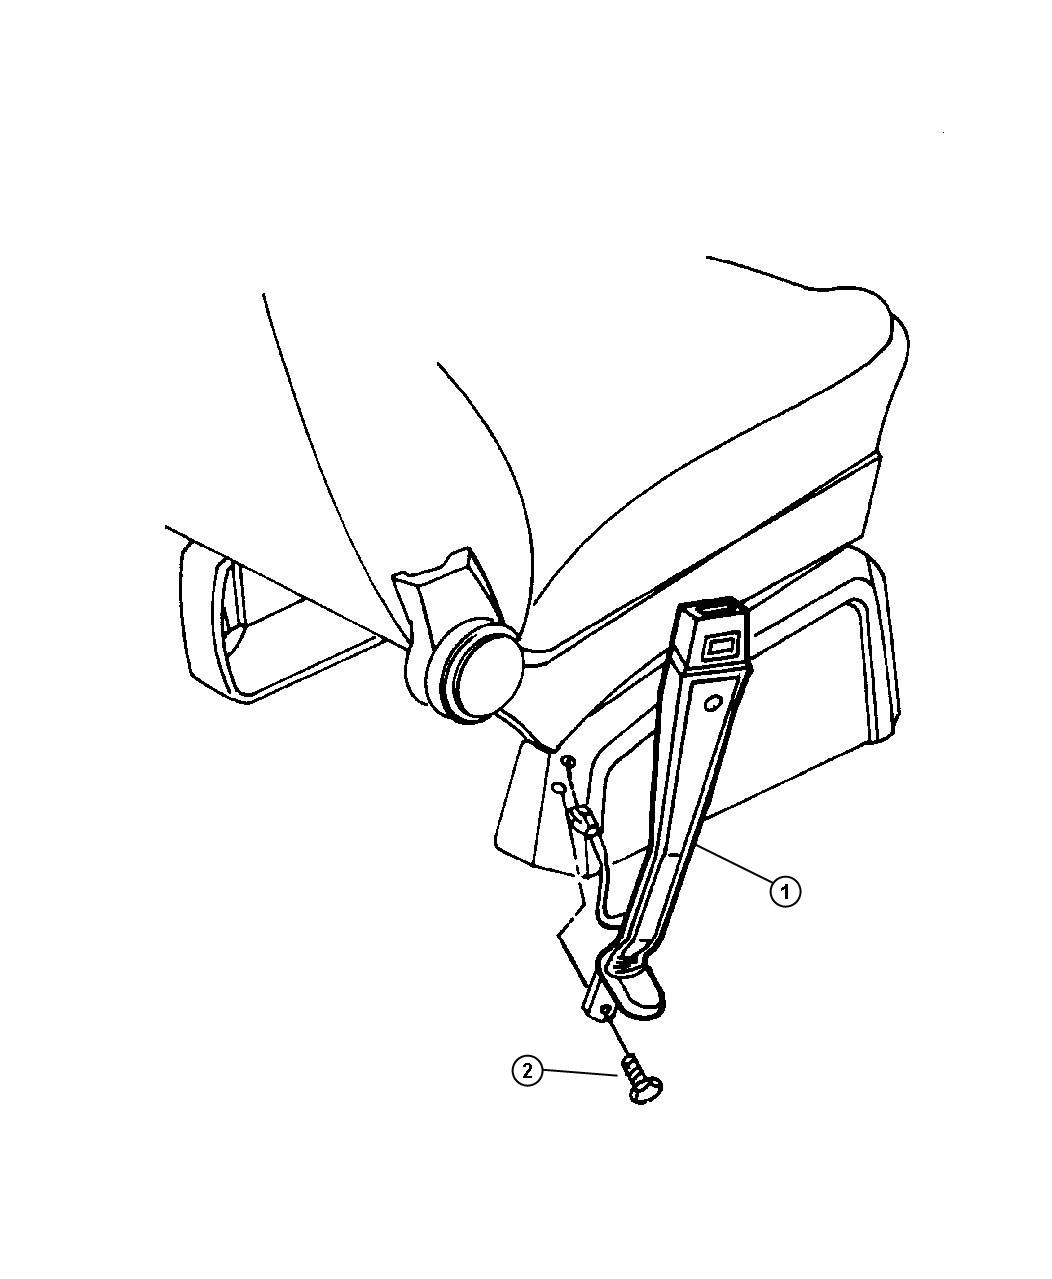 Dodge Caravan Seat Belt Rear Quad Inner D5 Trim